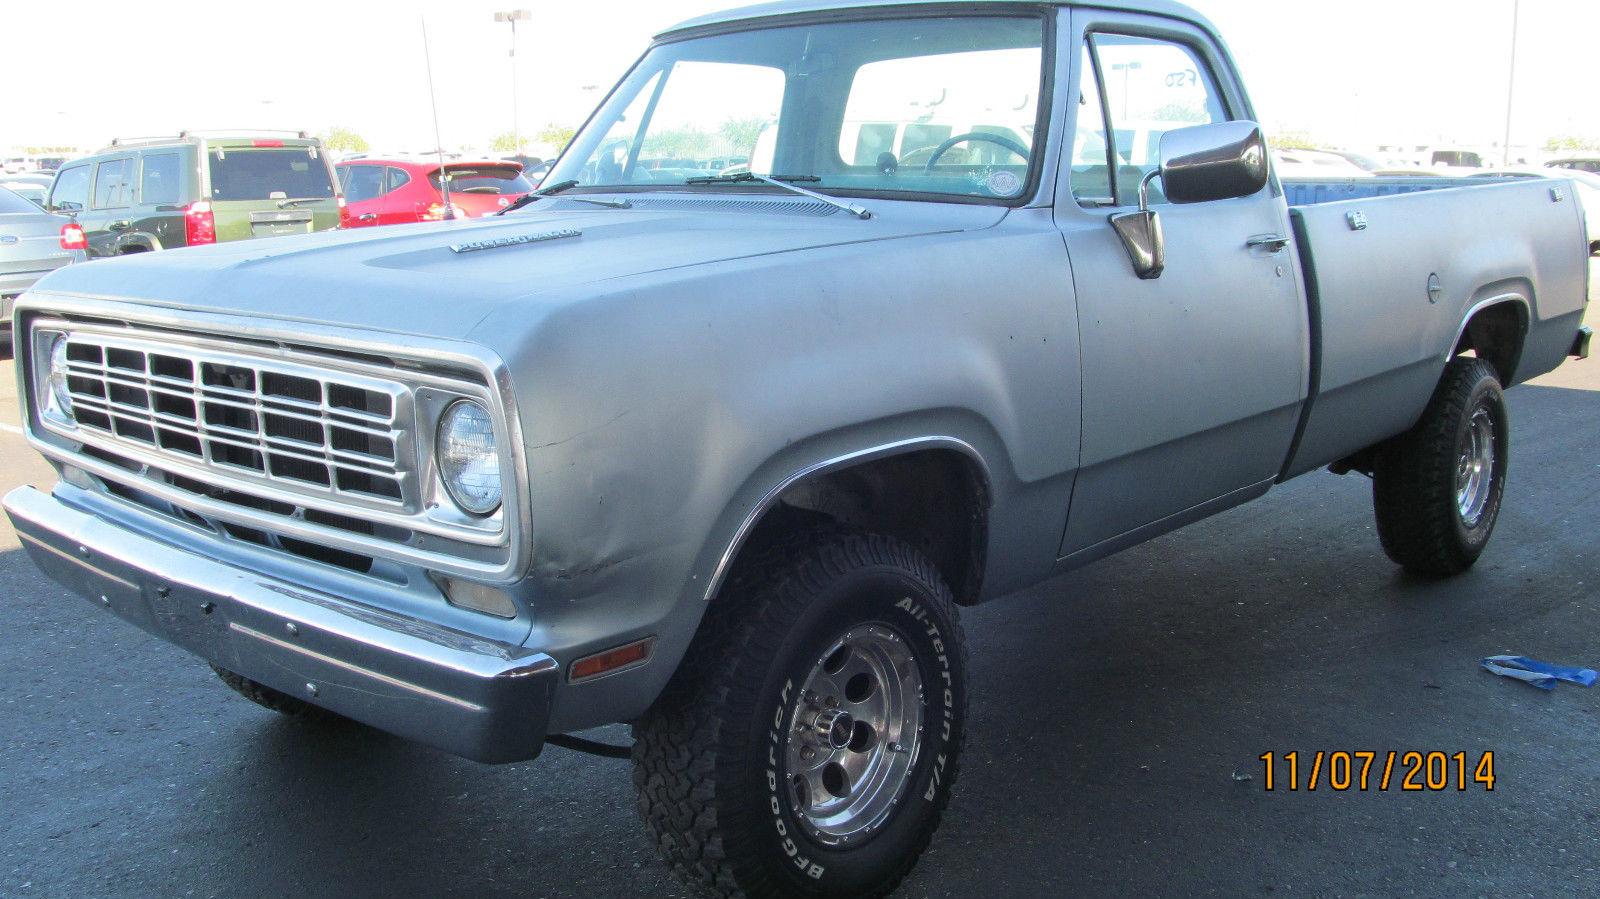 1976 Dodge Ram D100 Pickup Truck 93k Actual Miles No